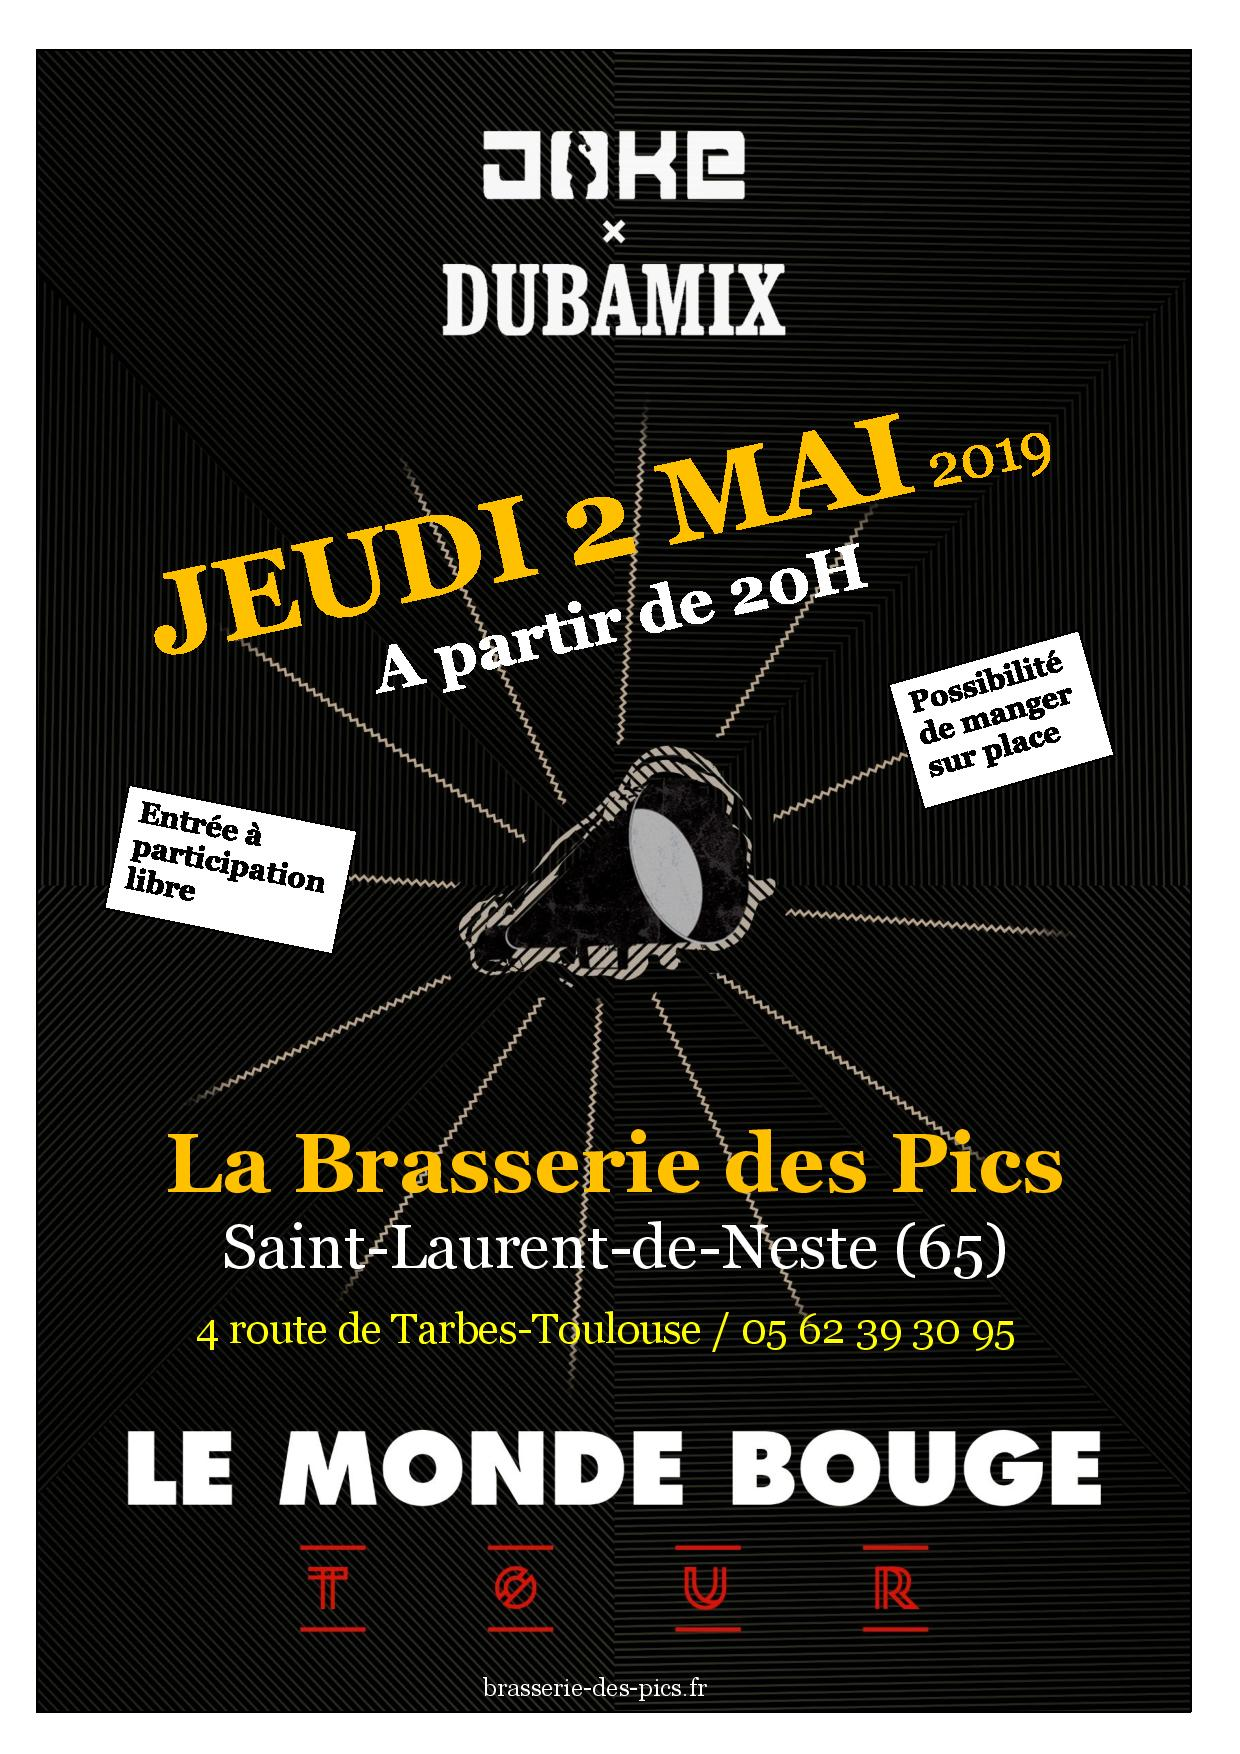 Dubamix x Joke @ Brasserie des Pics